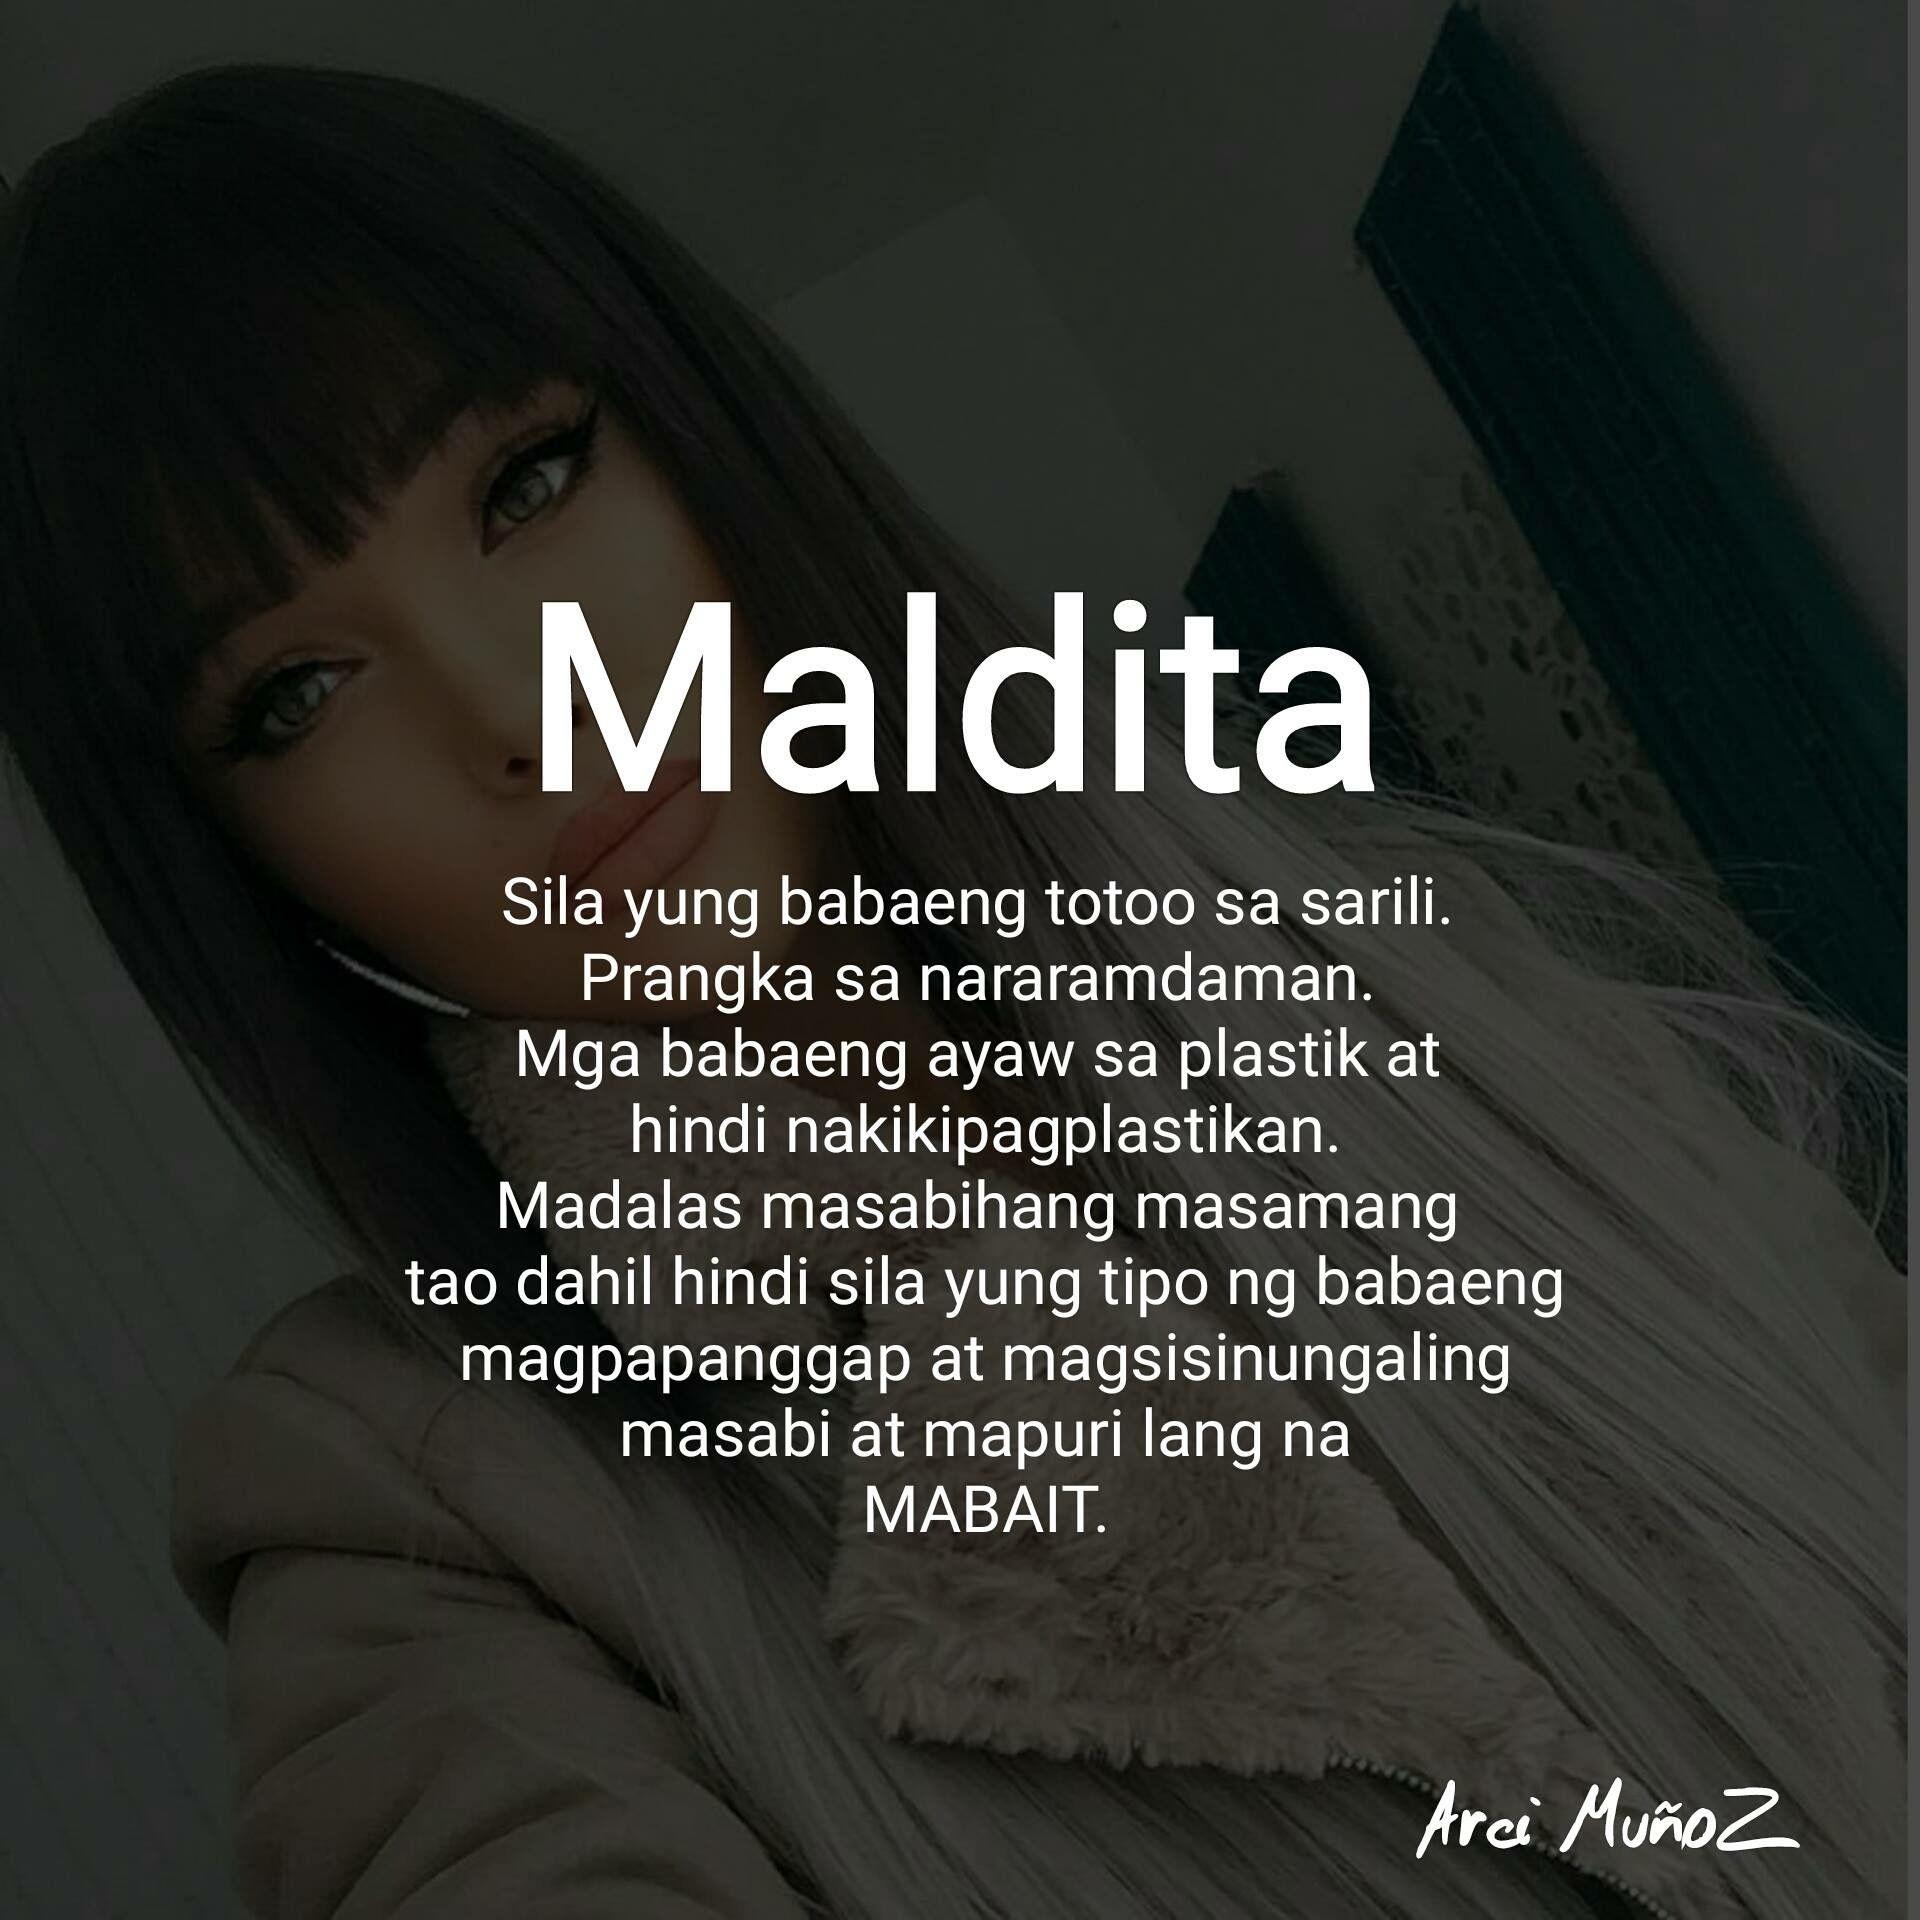 Mao Gyud Ko Tagalog Quotes Tagalog Quotes Hugot Funny Tagalog Quotes Funny